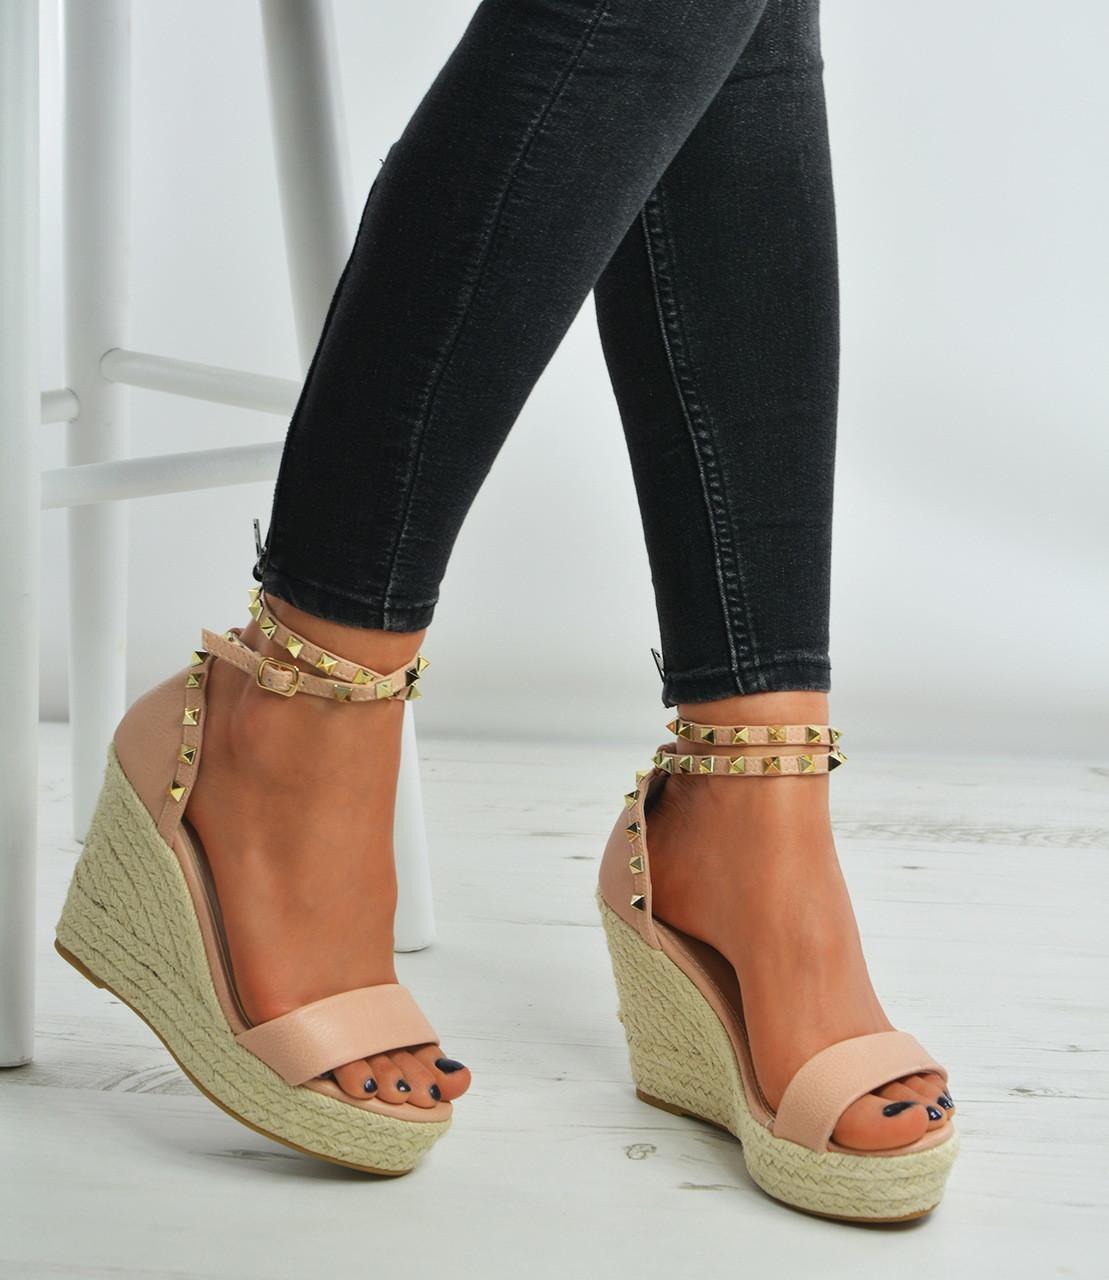 5c23b1f2149 PINK Pu Rock Studs Espadrille High Wedge Heels Platform Sandals Shoes Size  Uk 3-8